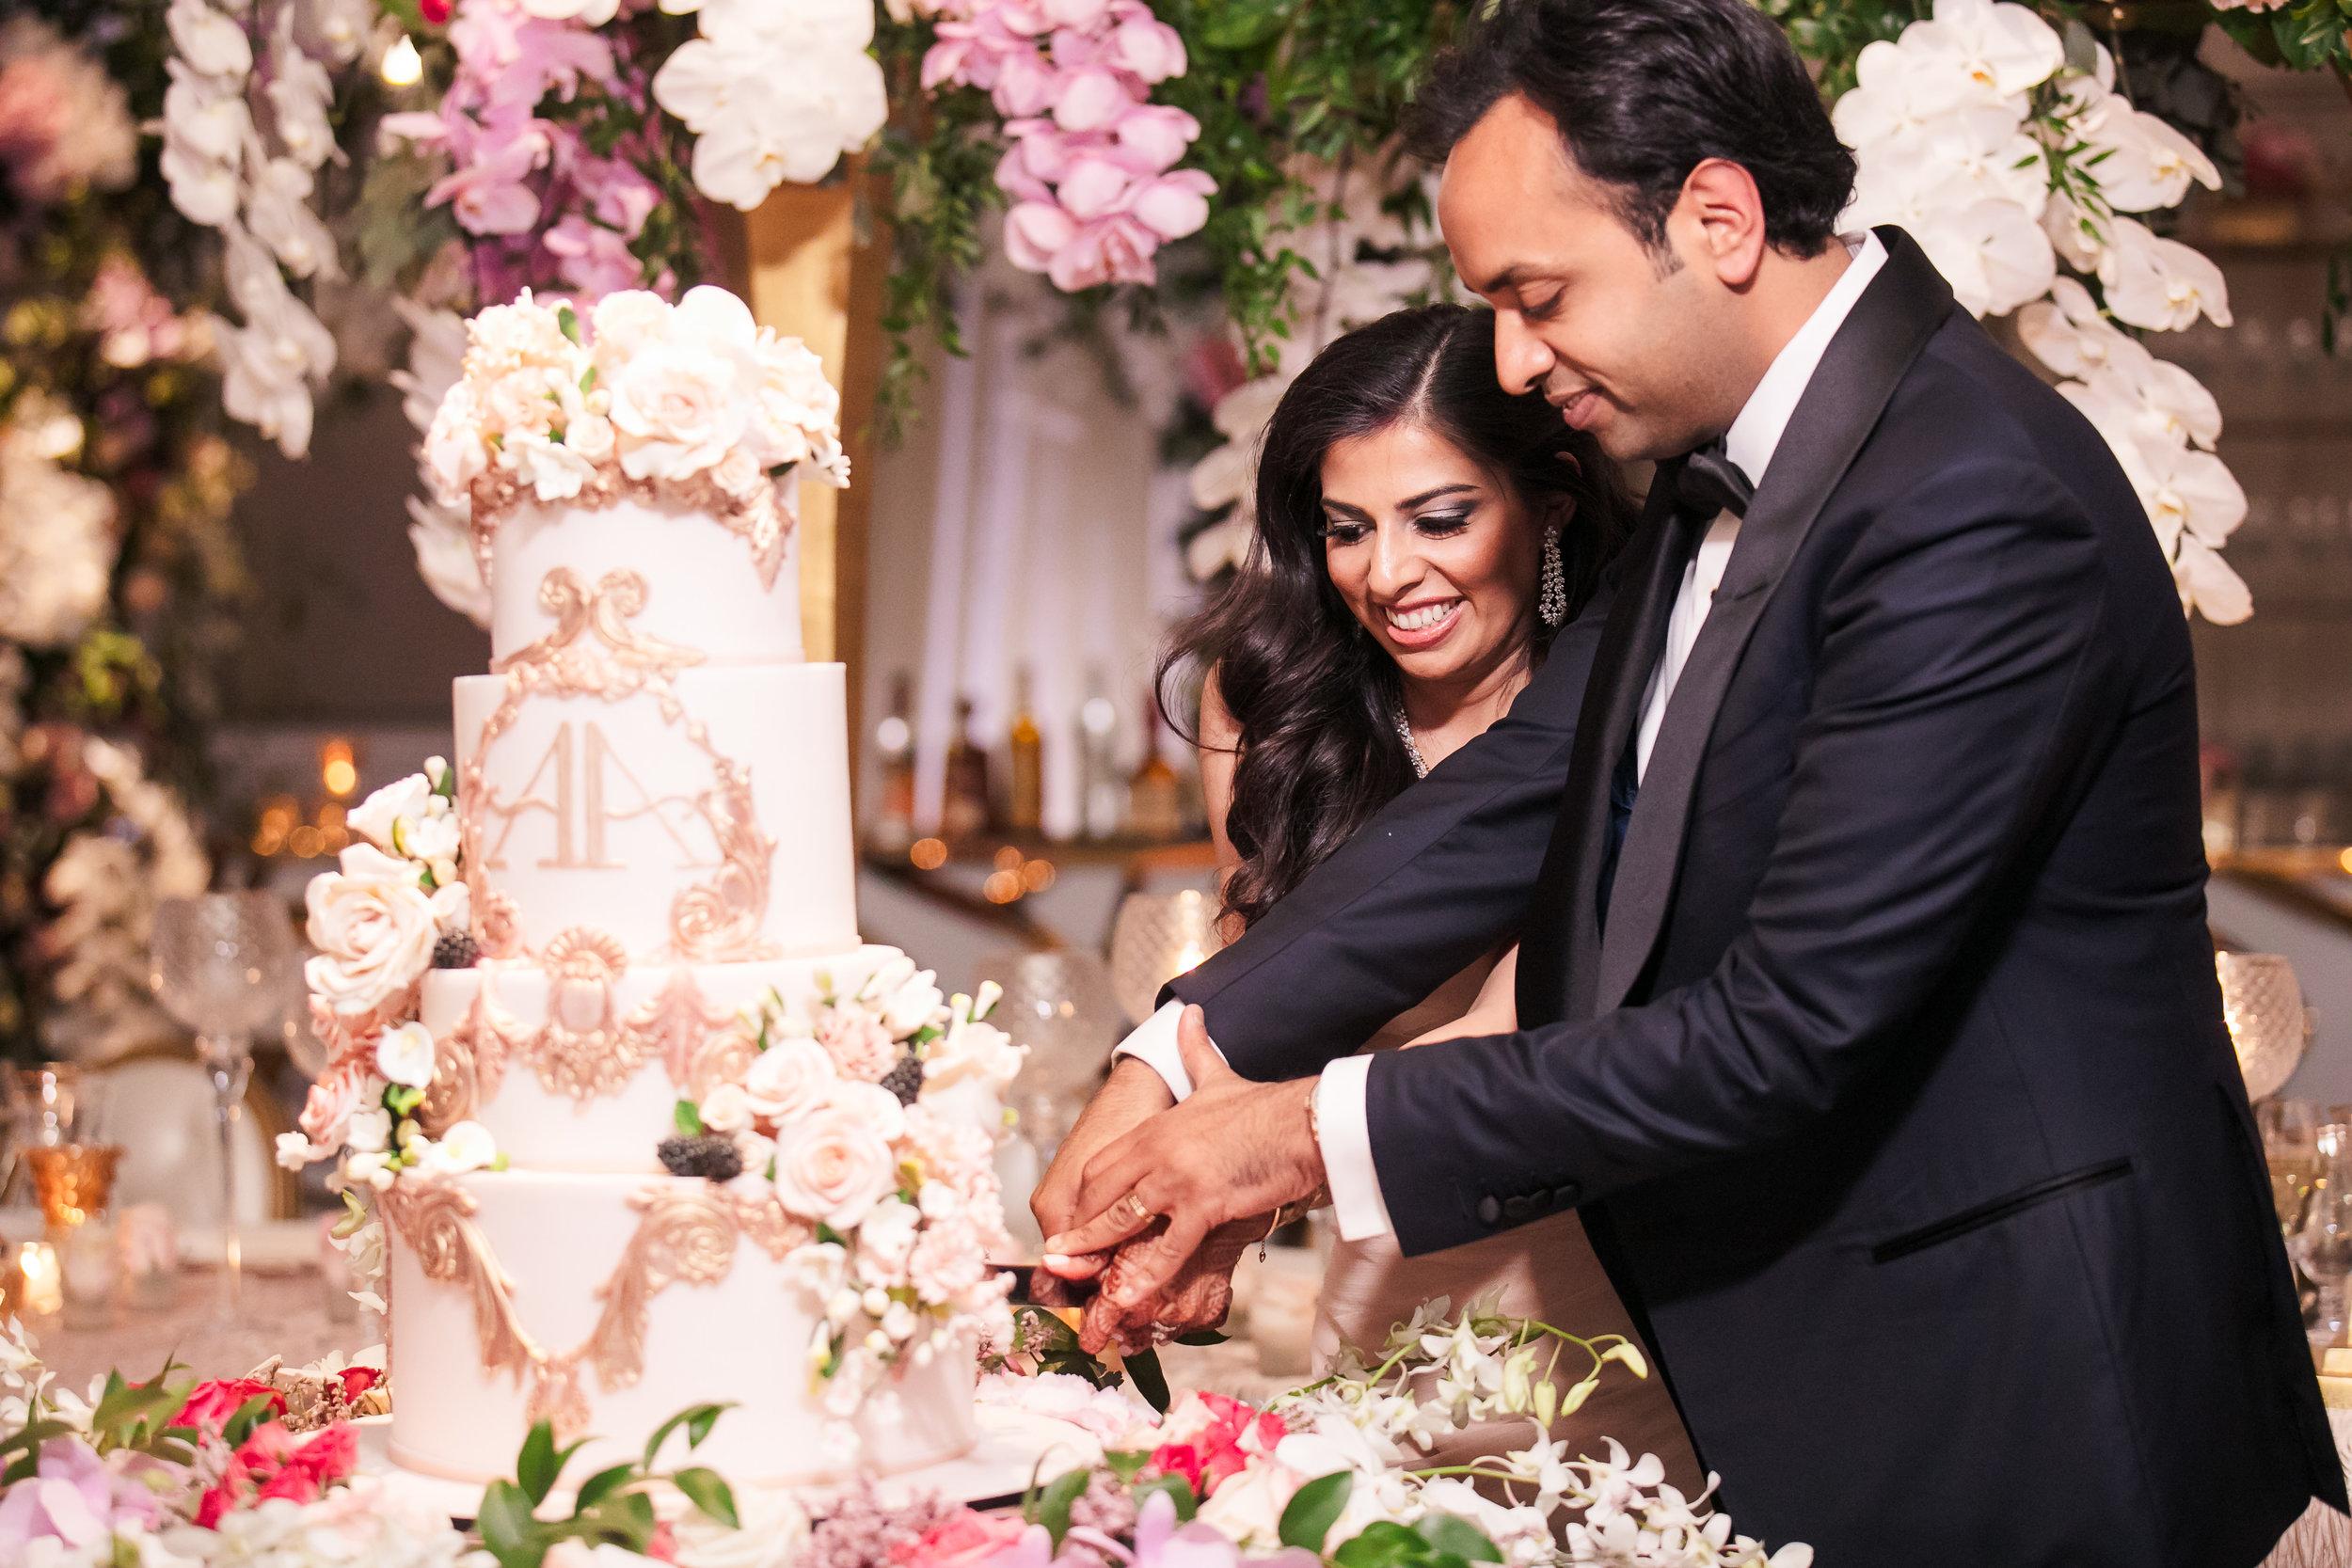 INDIAN WEDDING BRIDE AND GROOM CUTTING CAKE.jpg